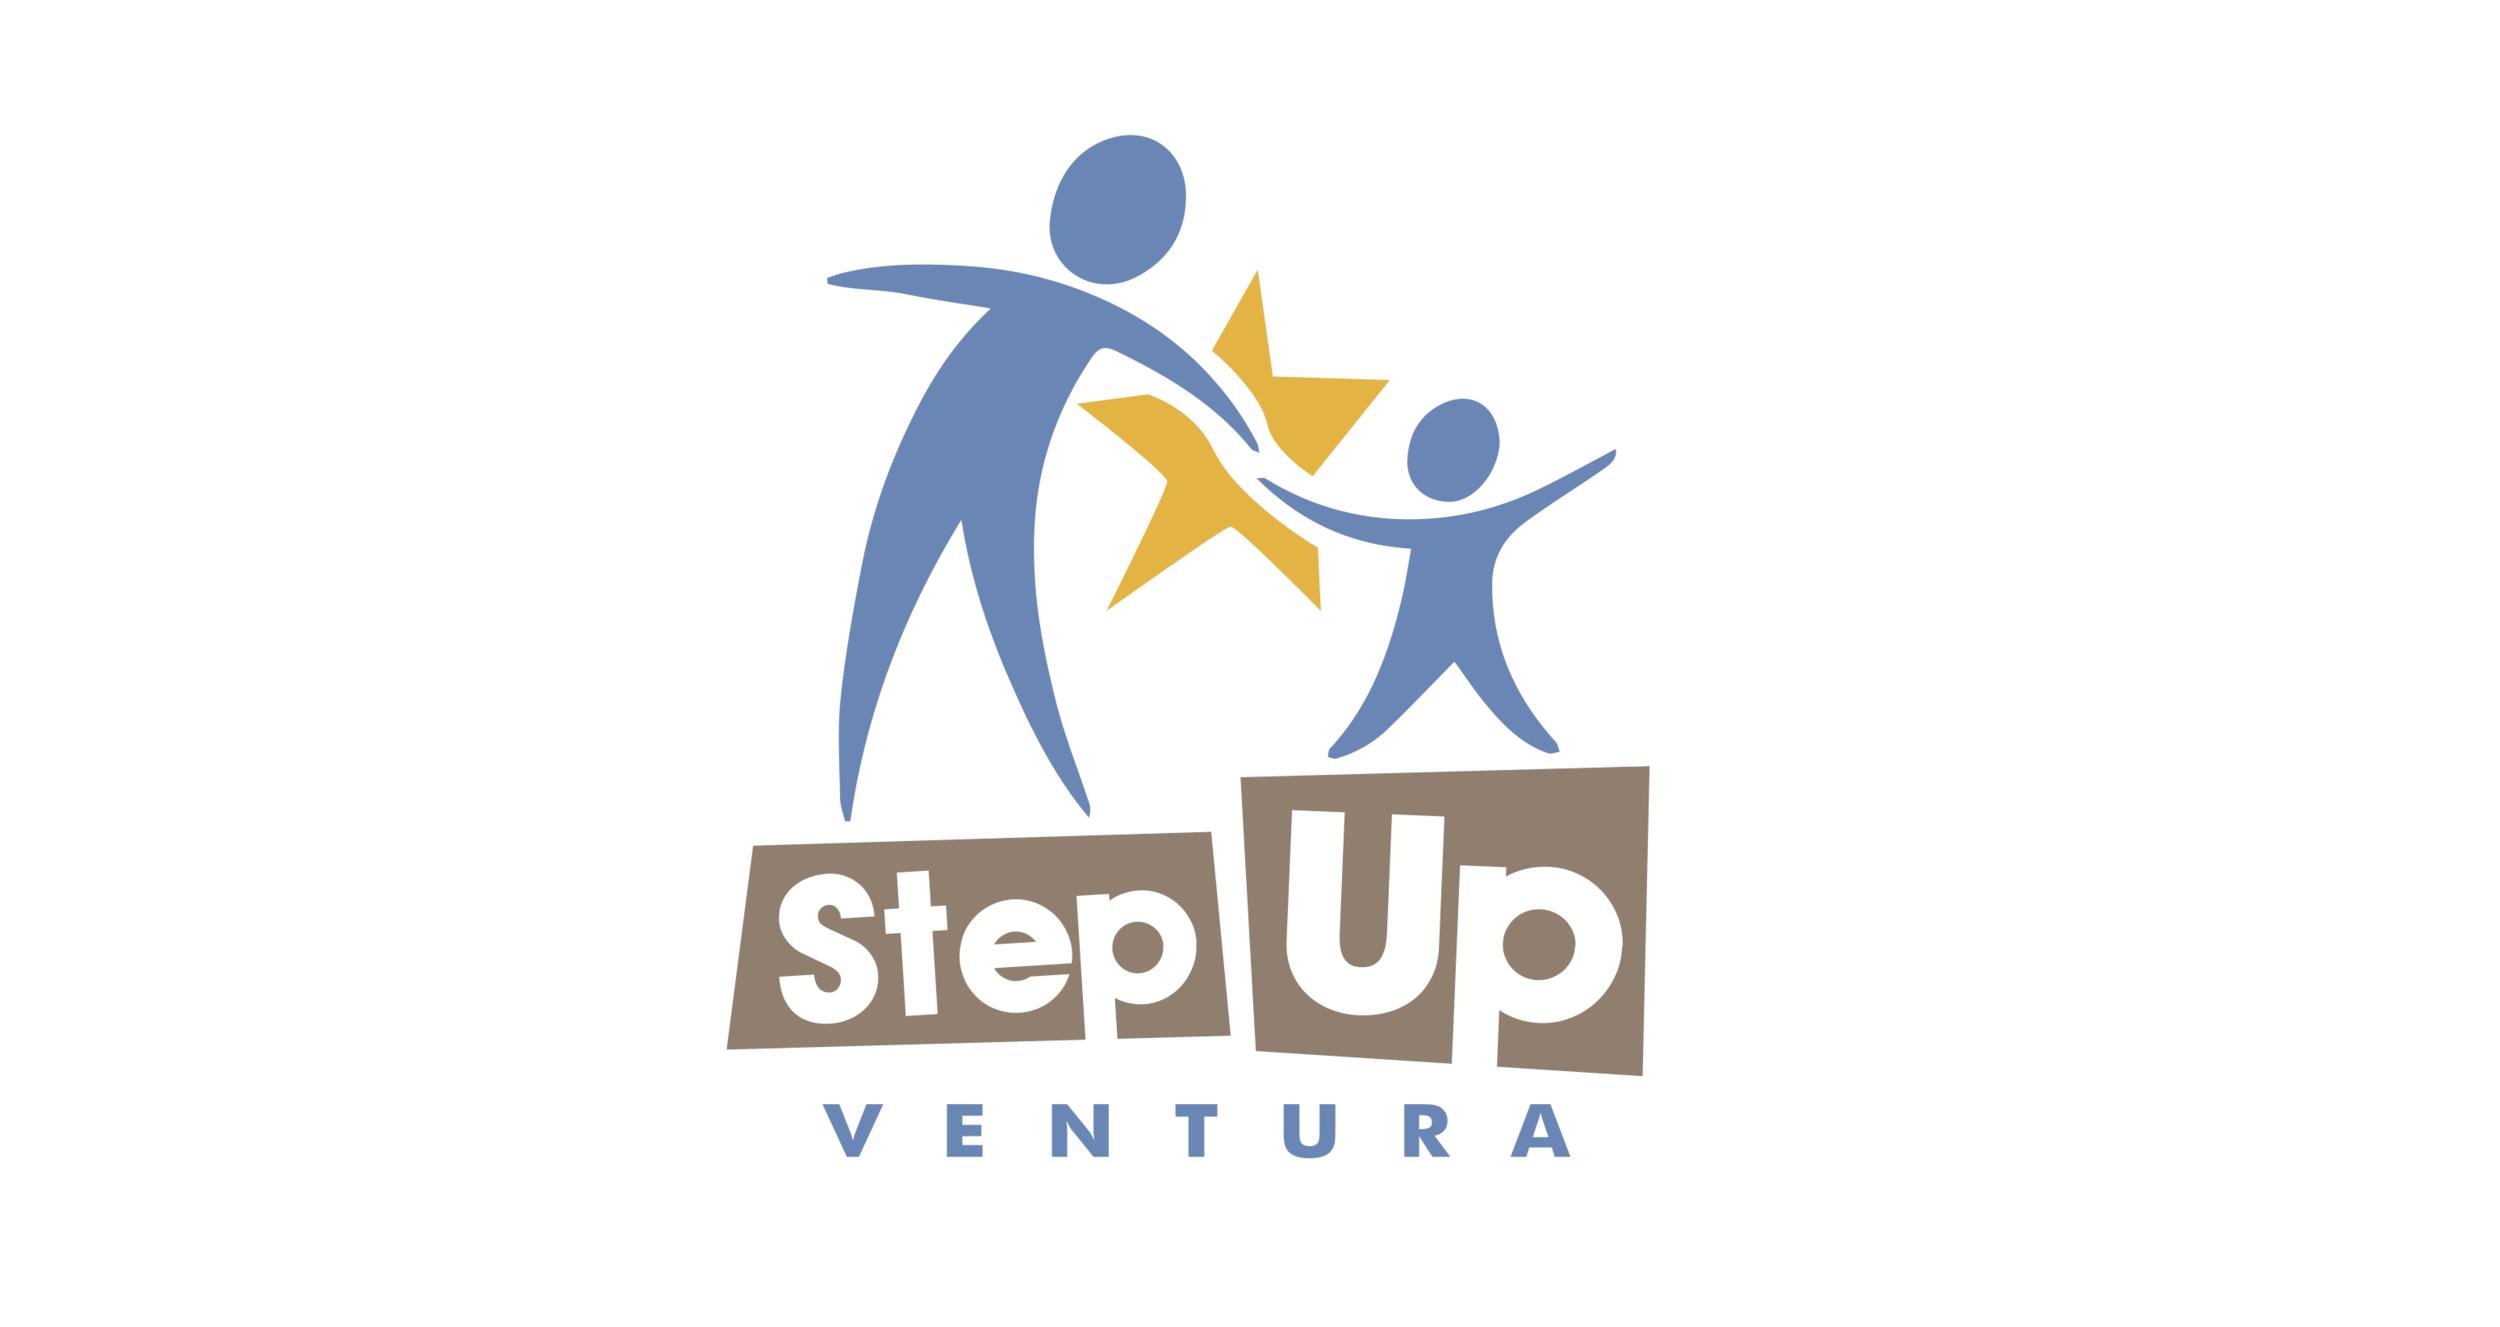 Step Up Ventura